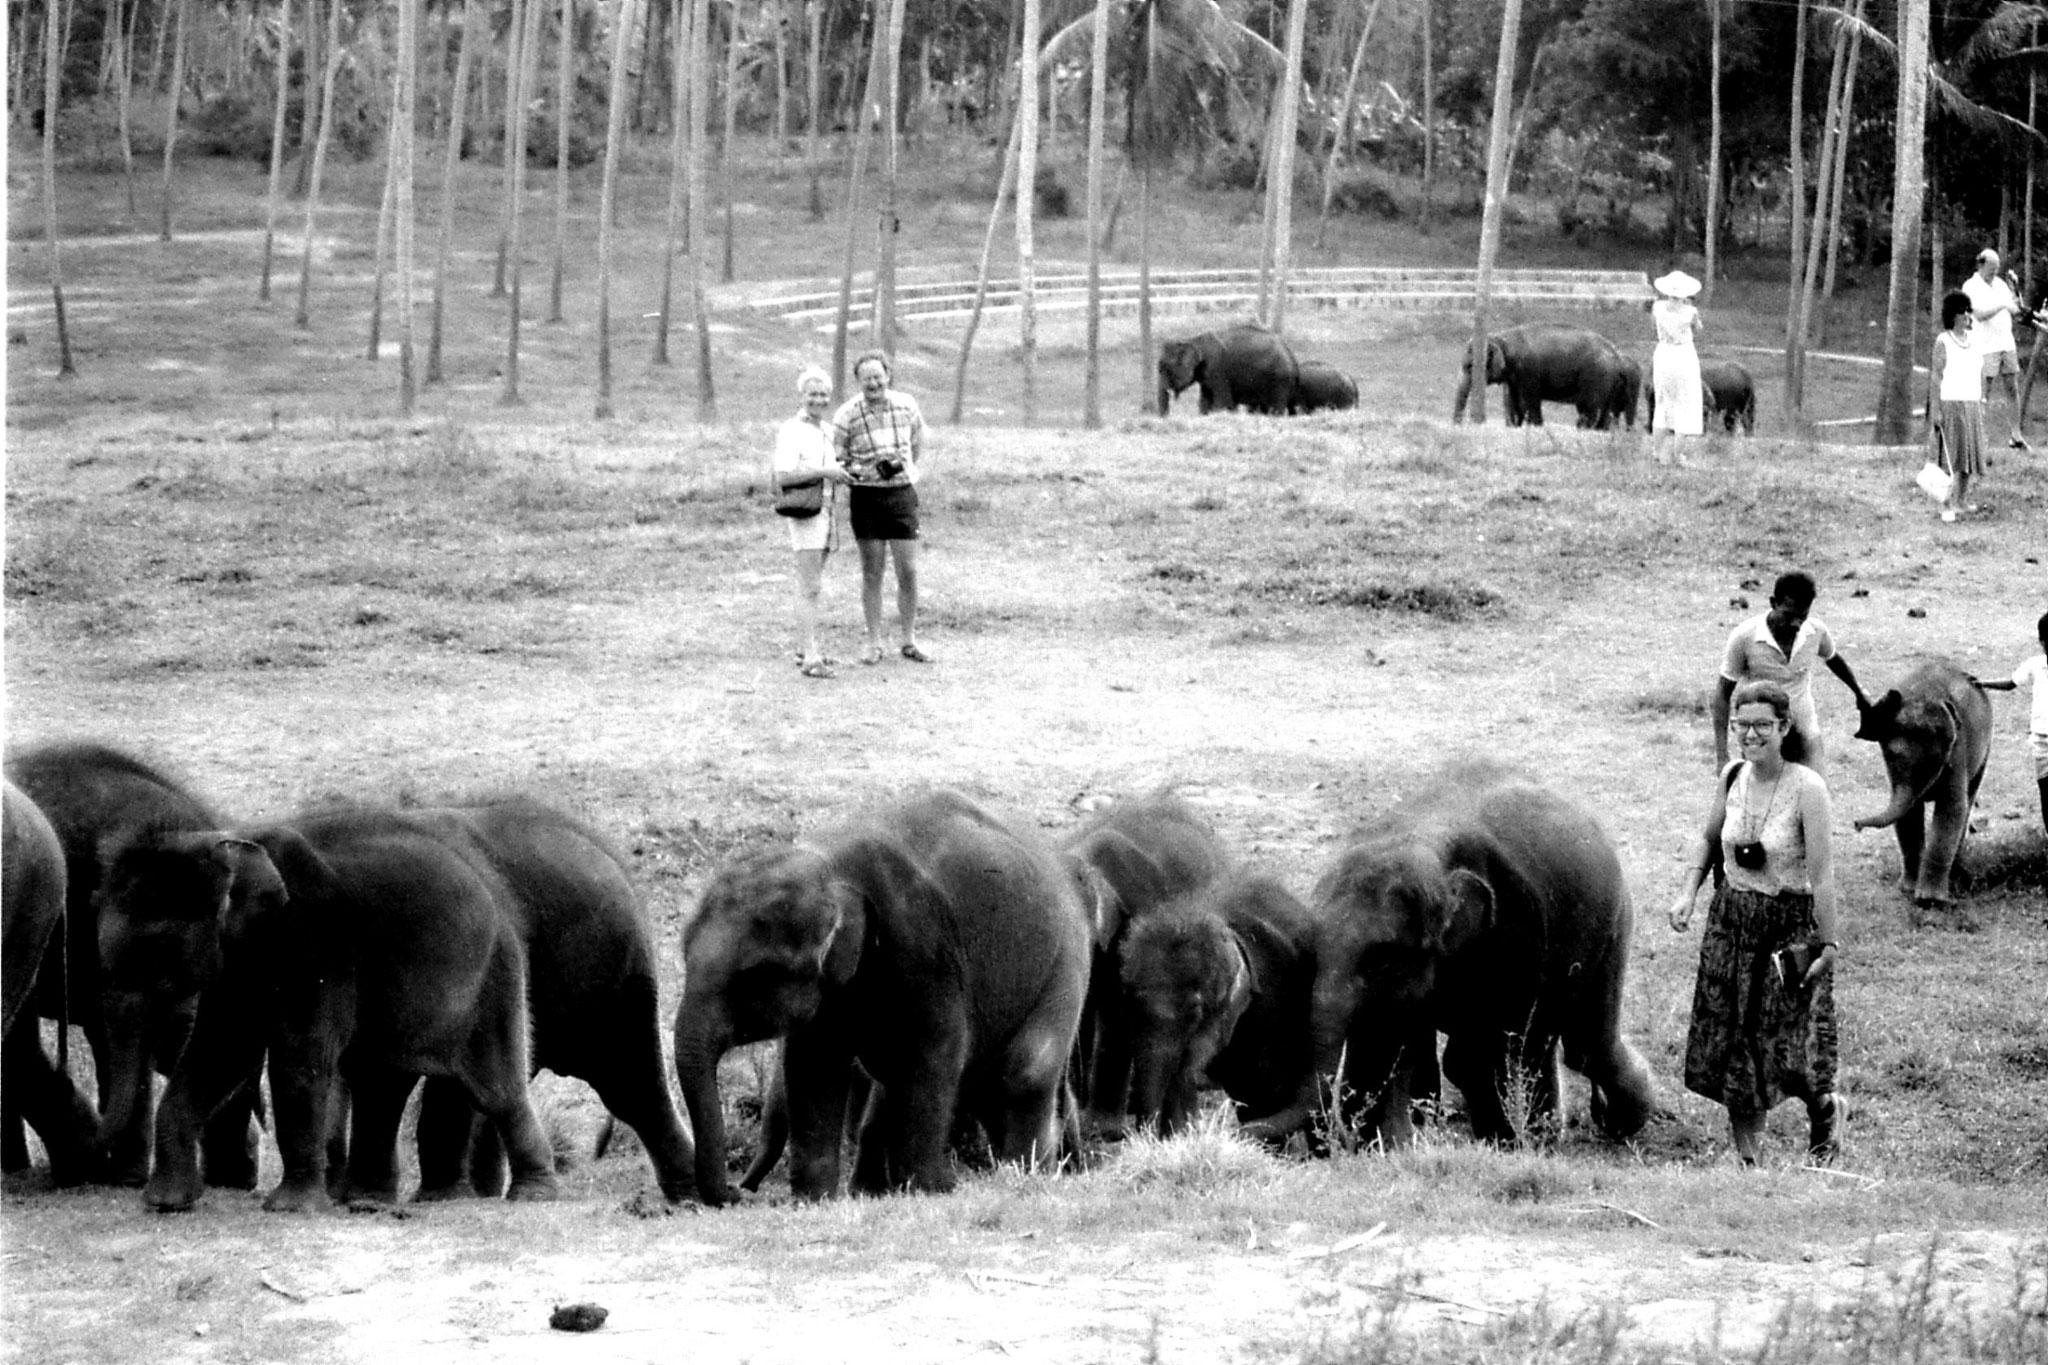 10/2/90: 33: Kegalla elephant orphanage